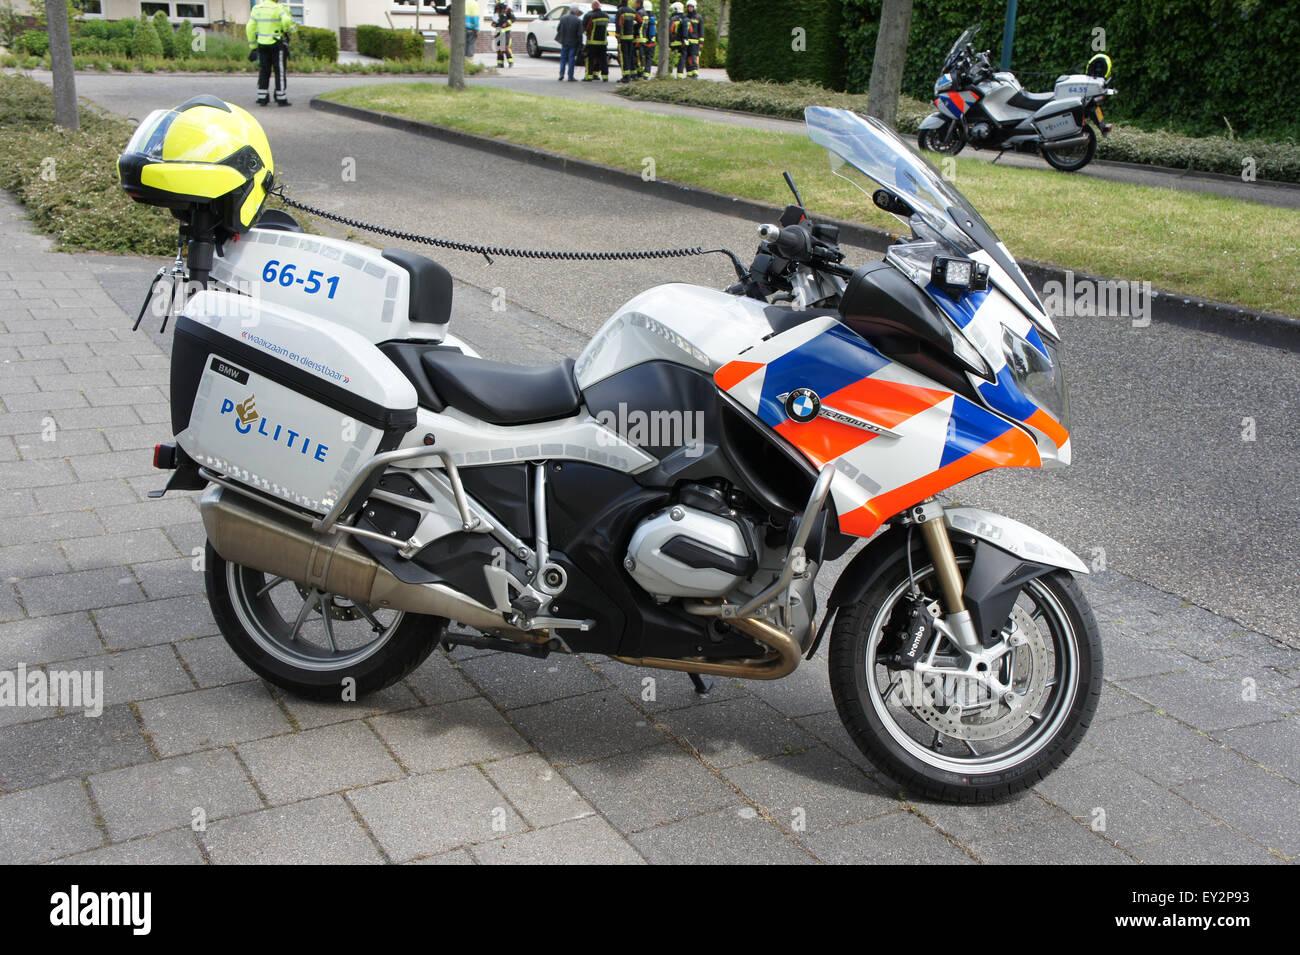 Police Motorbike Bmw R1200rt Unit 66 51 Pic1 Stock Photo 85498591